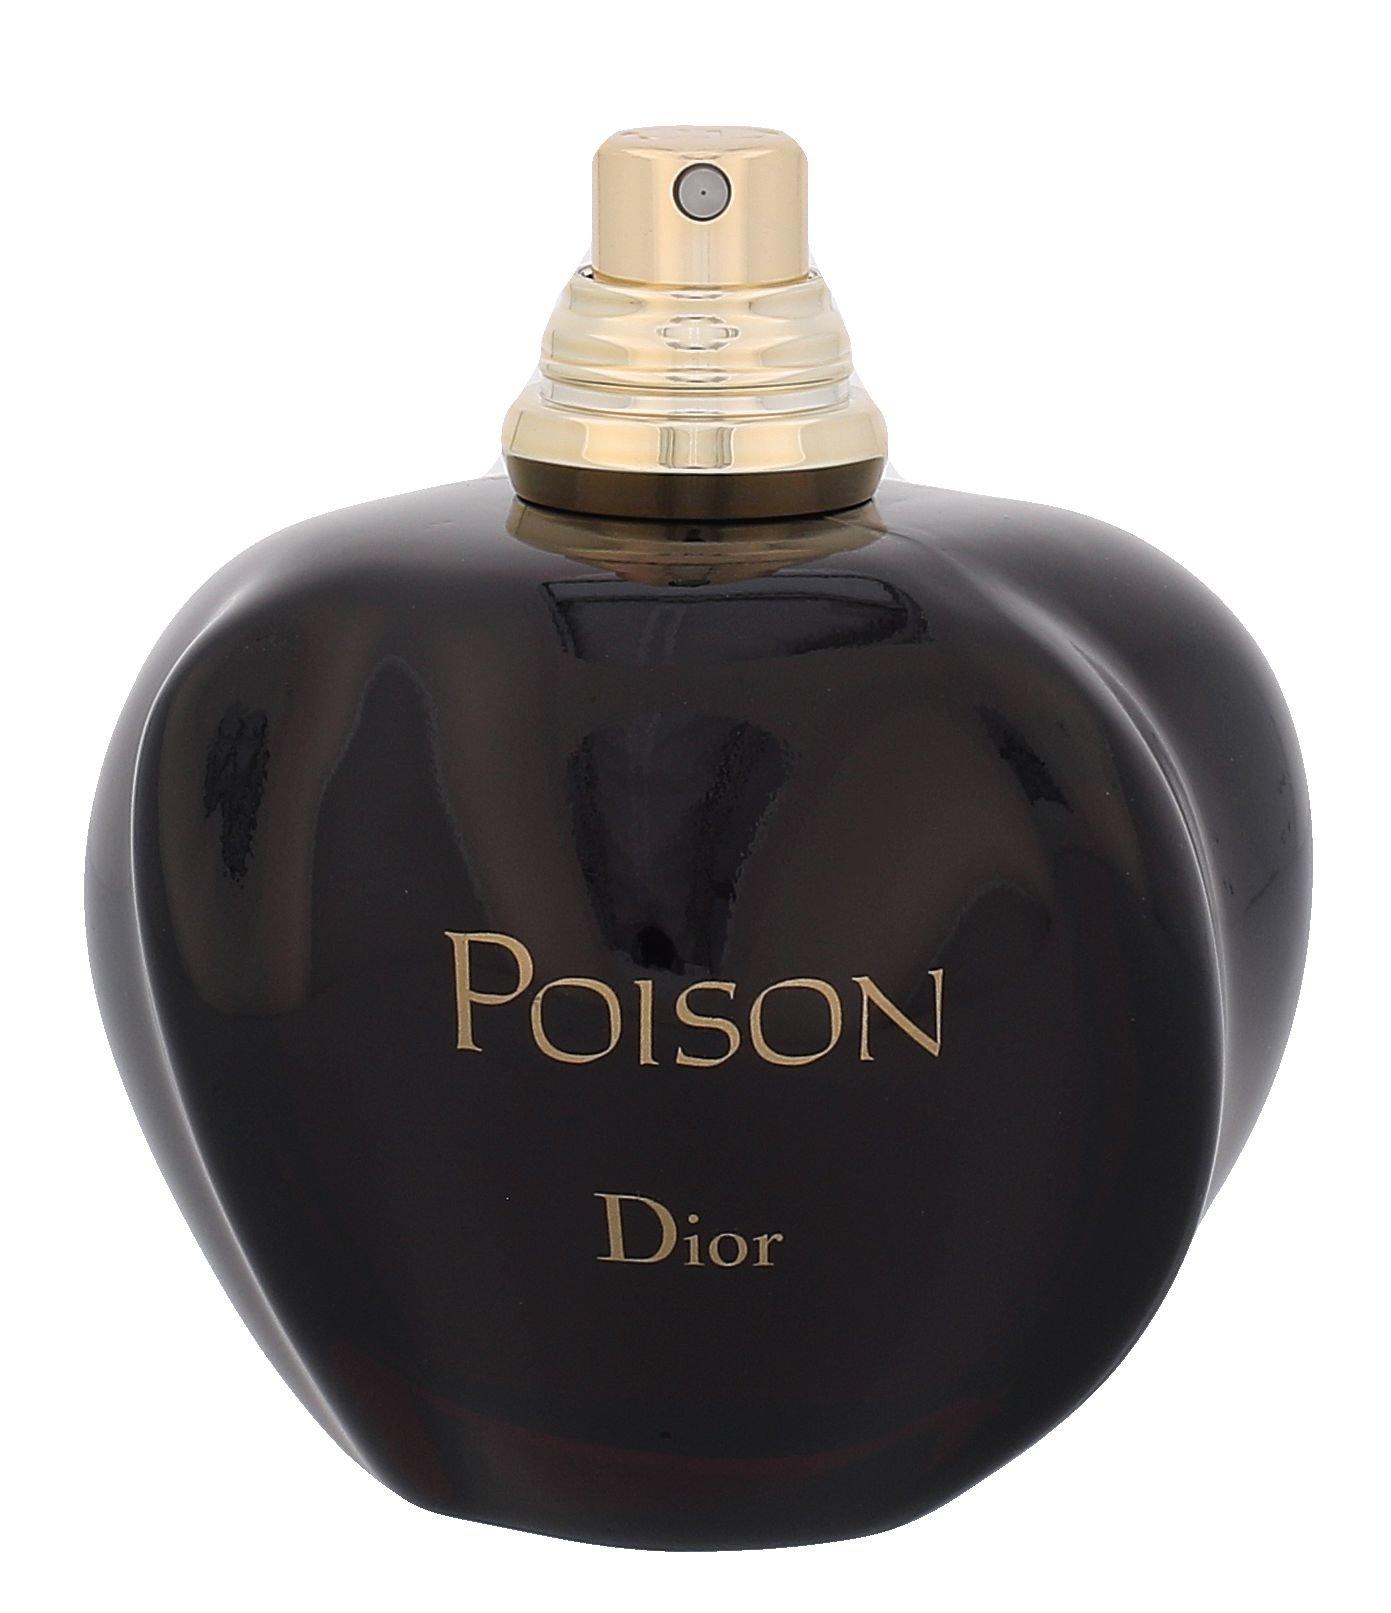 Christian Dior Poison EDT 100ml